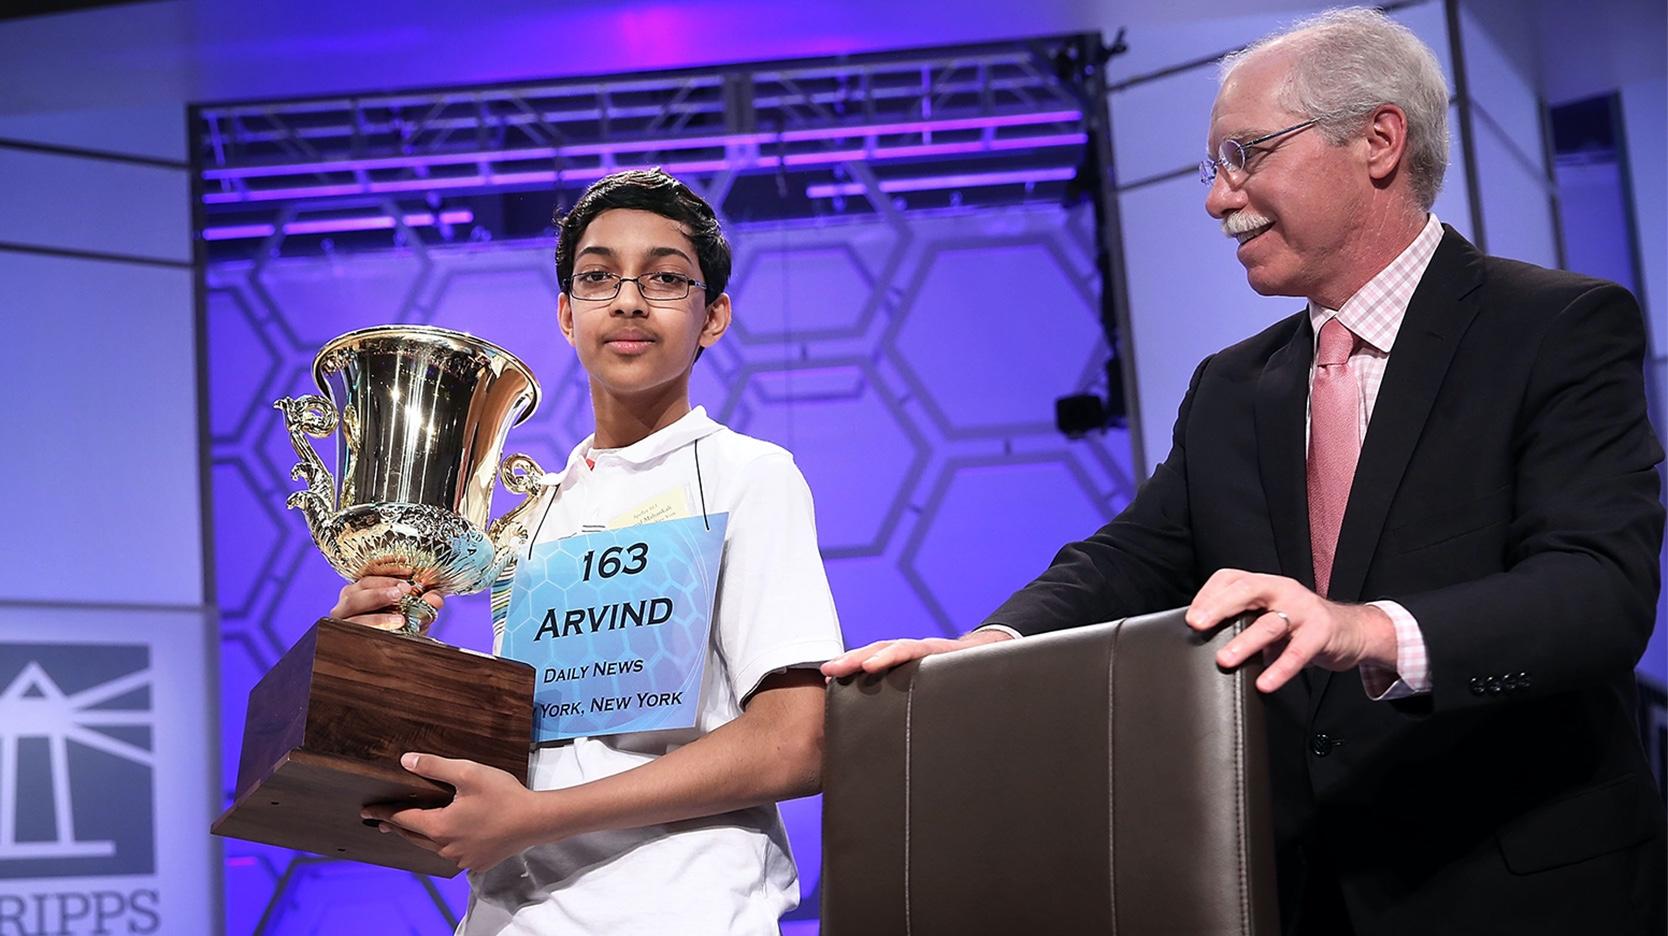 Arvind Mahankali Scripps National Spelling Bee Champion 2013